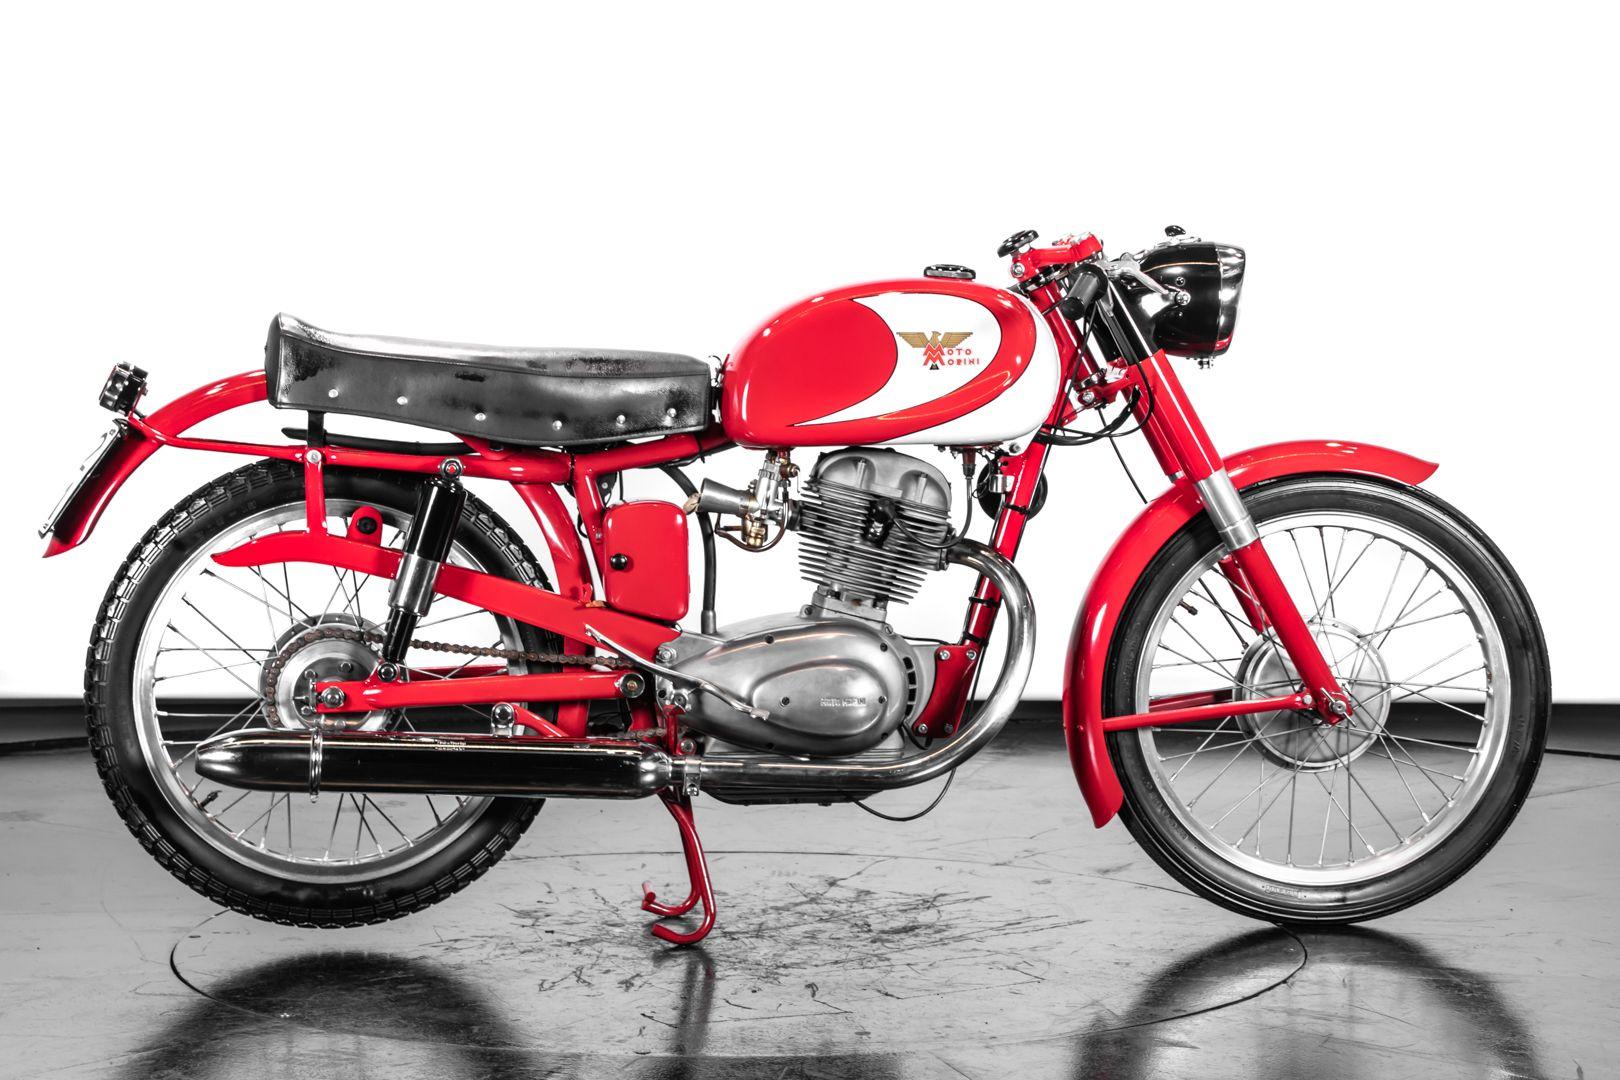 1958 Moto Morini S 175 78012